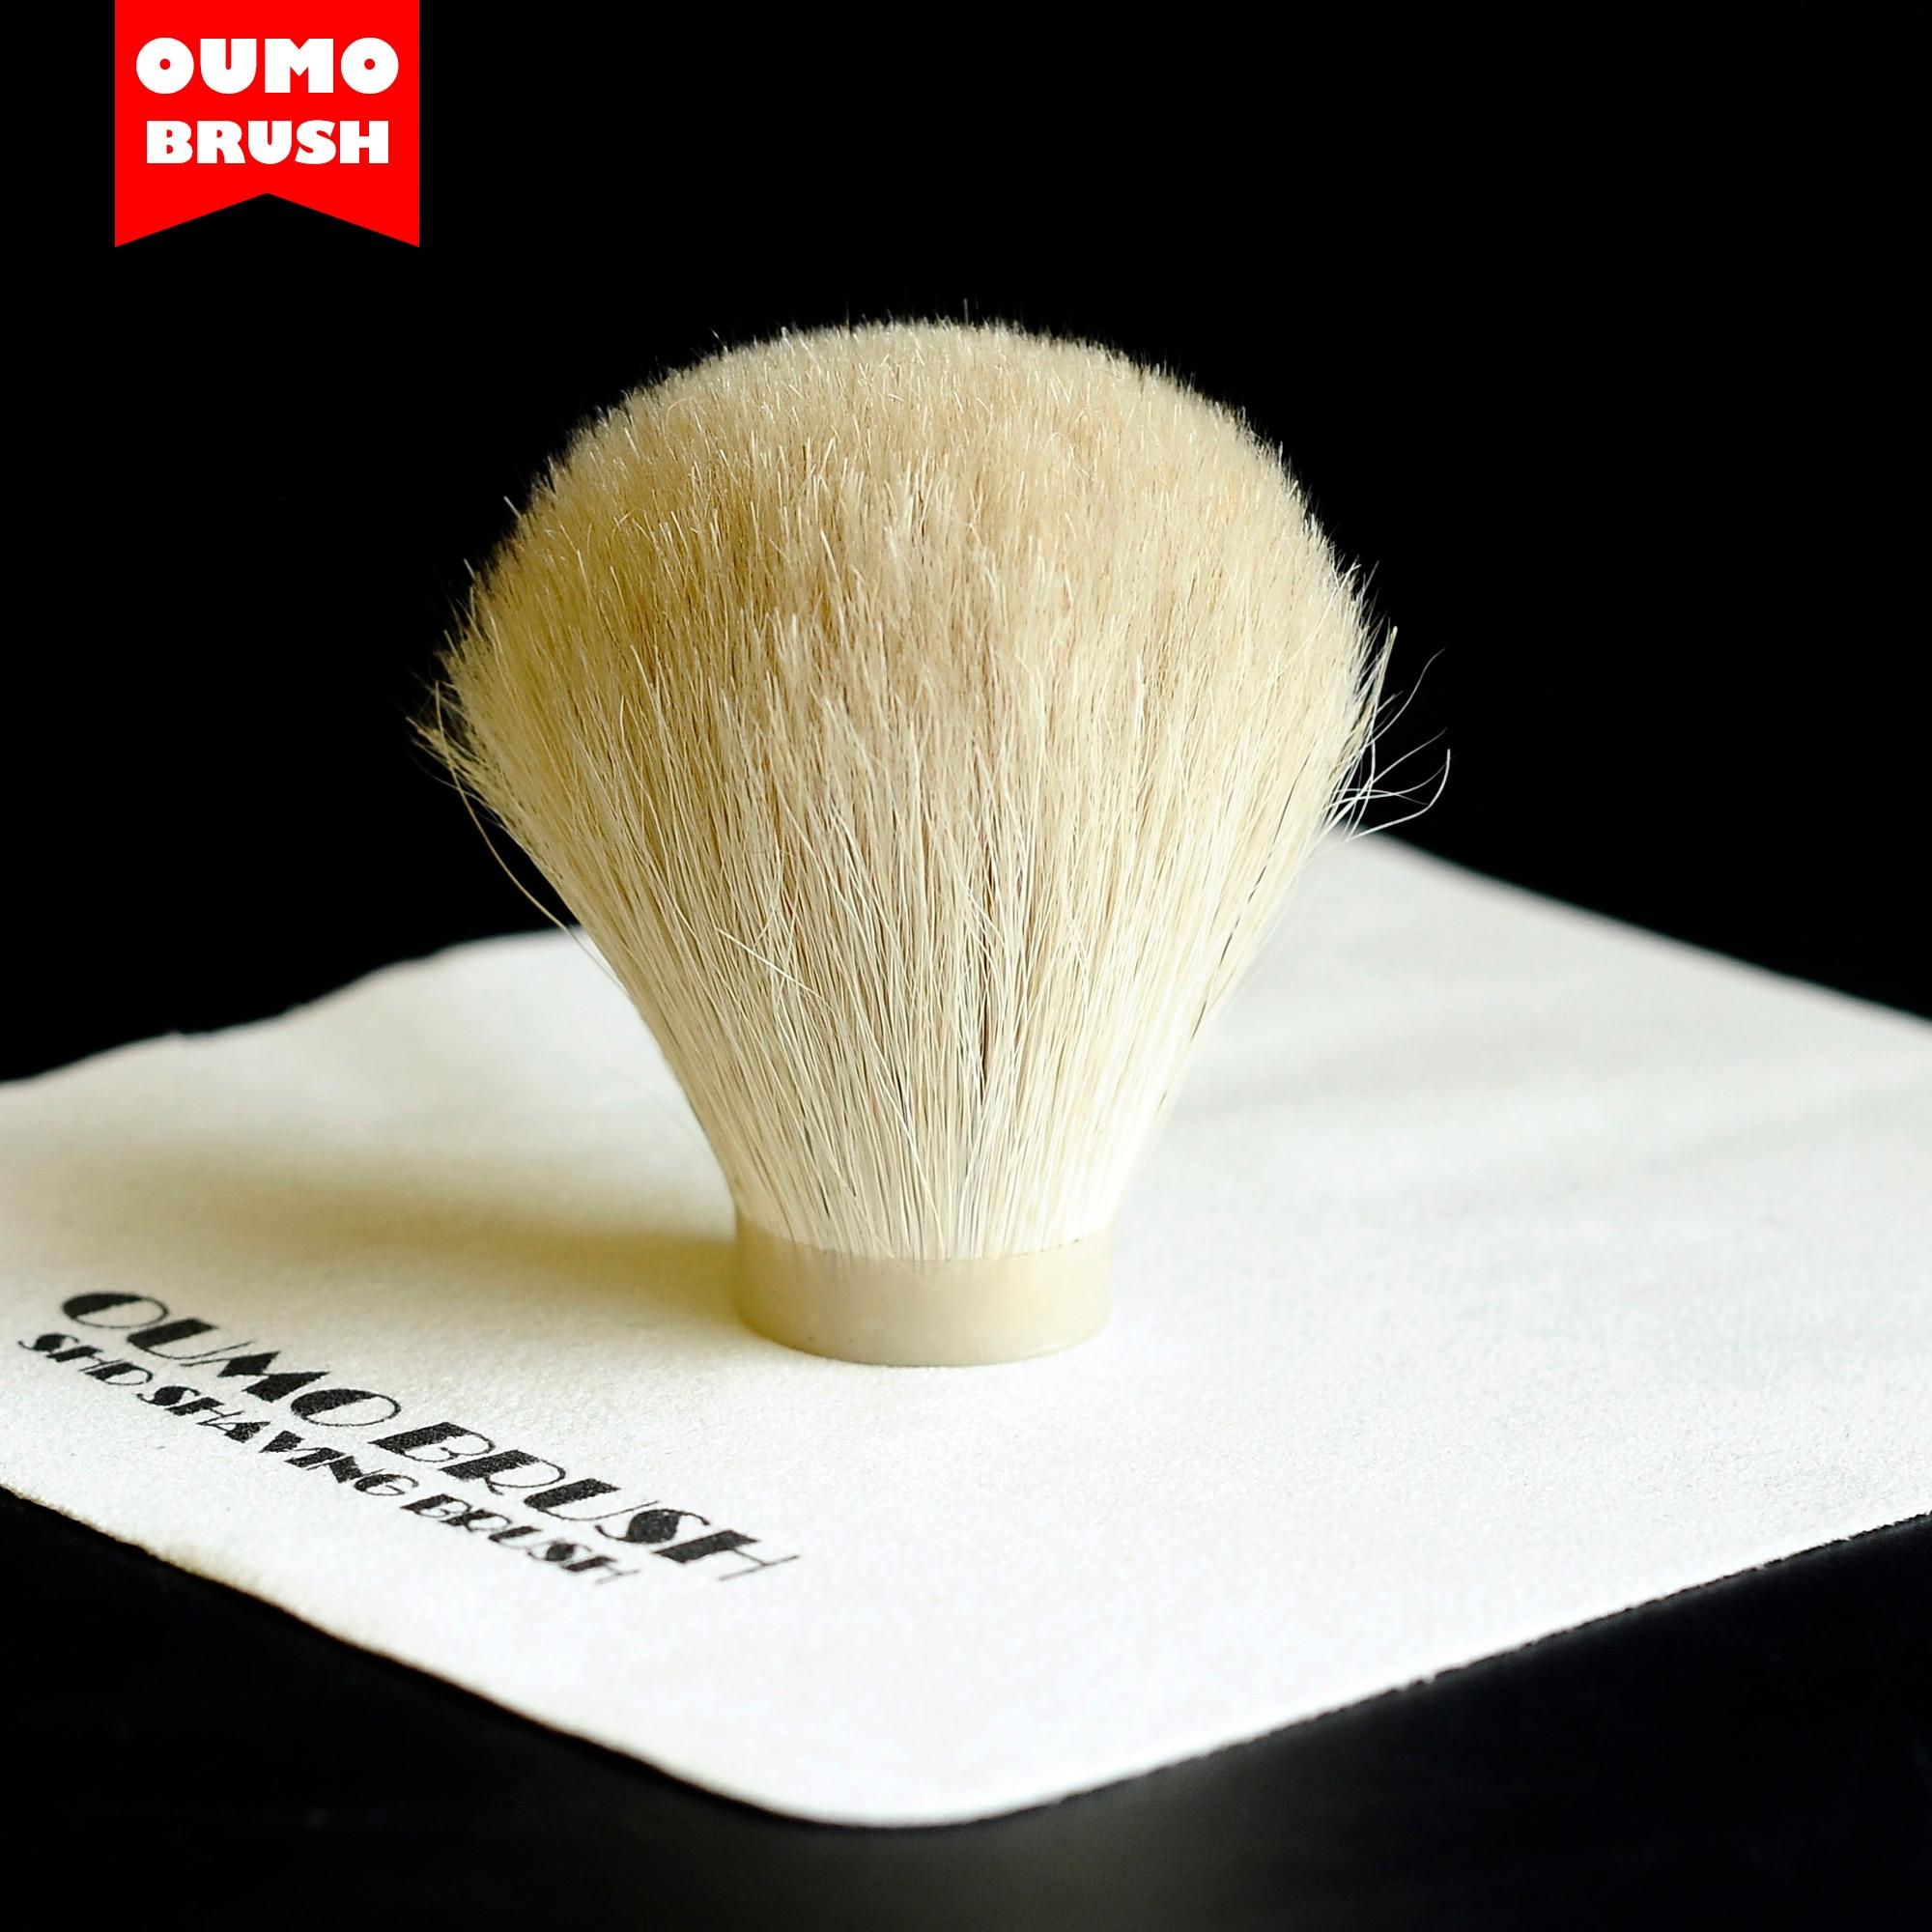 OUMO BRUSH-high Quality White Horse Hair Knot Shaving Brush Knots